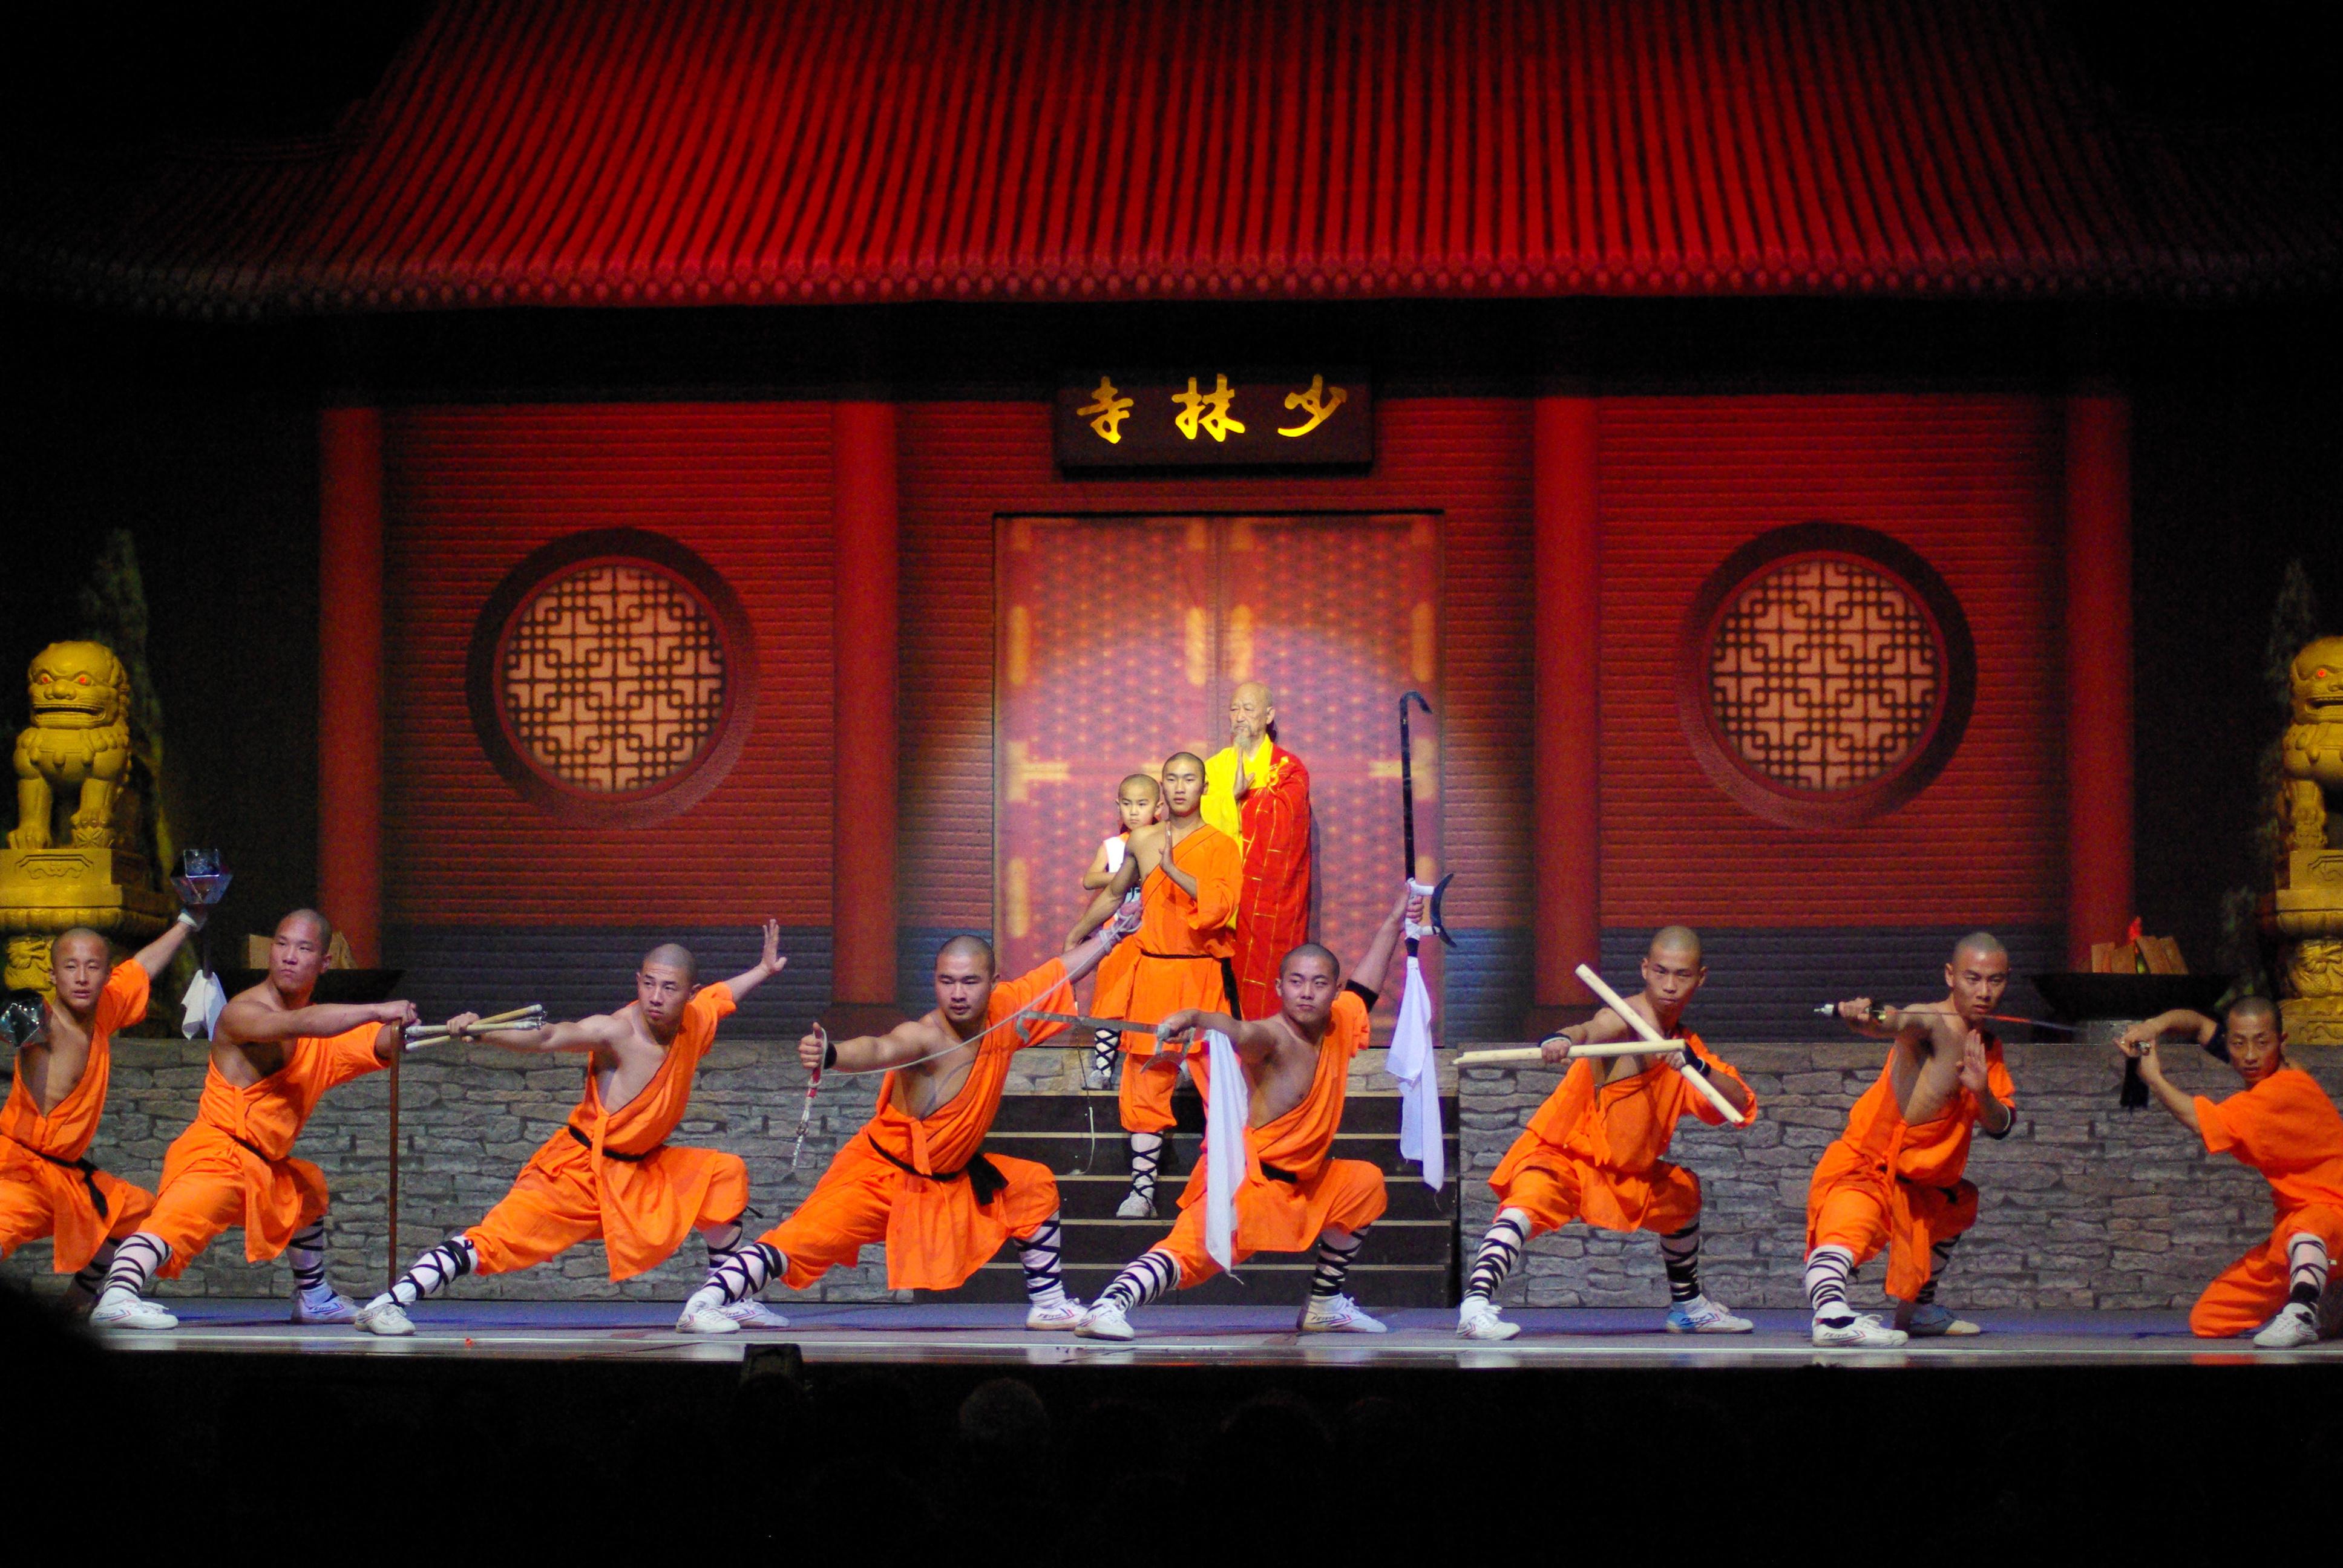 shaolin kung fu chan academy in redmond wa 98052. Black Bedroom Furniture Sets. Home Design Ideas